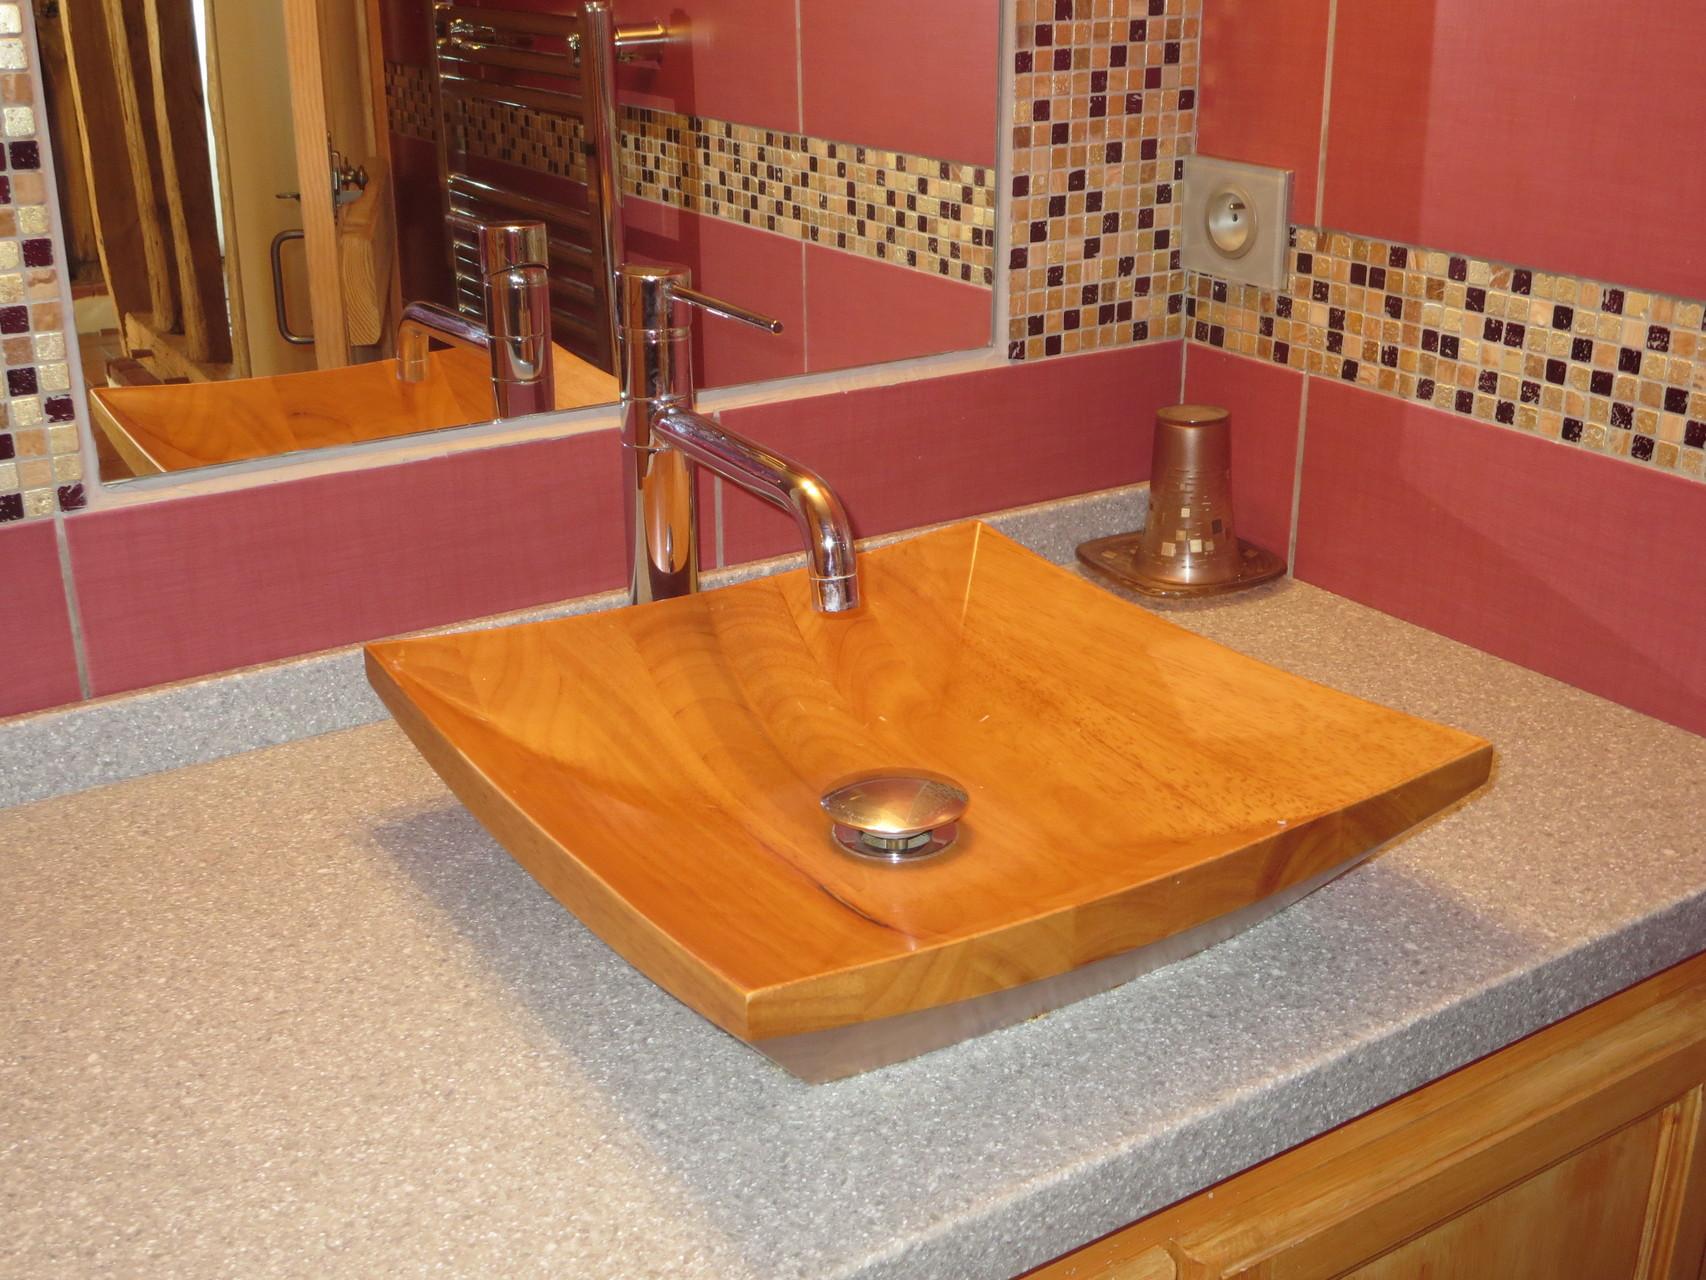 Vasque en bois de la salle de bain.